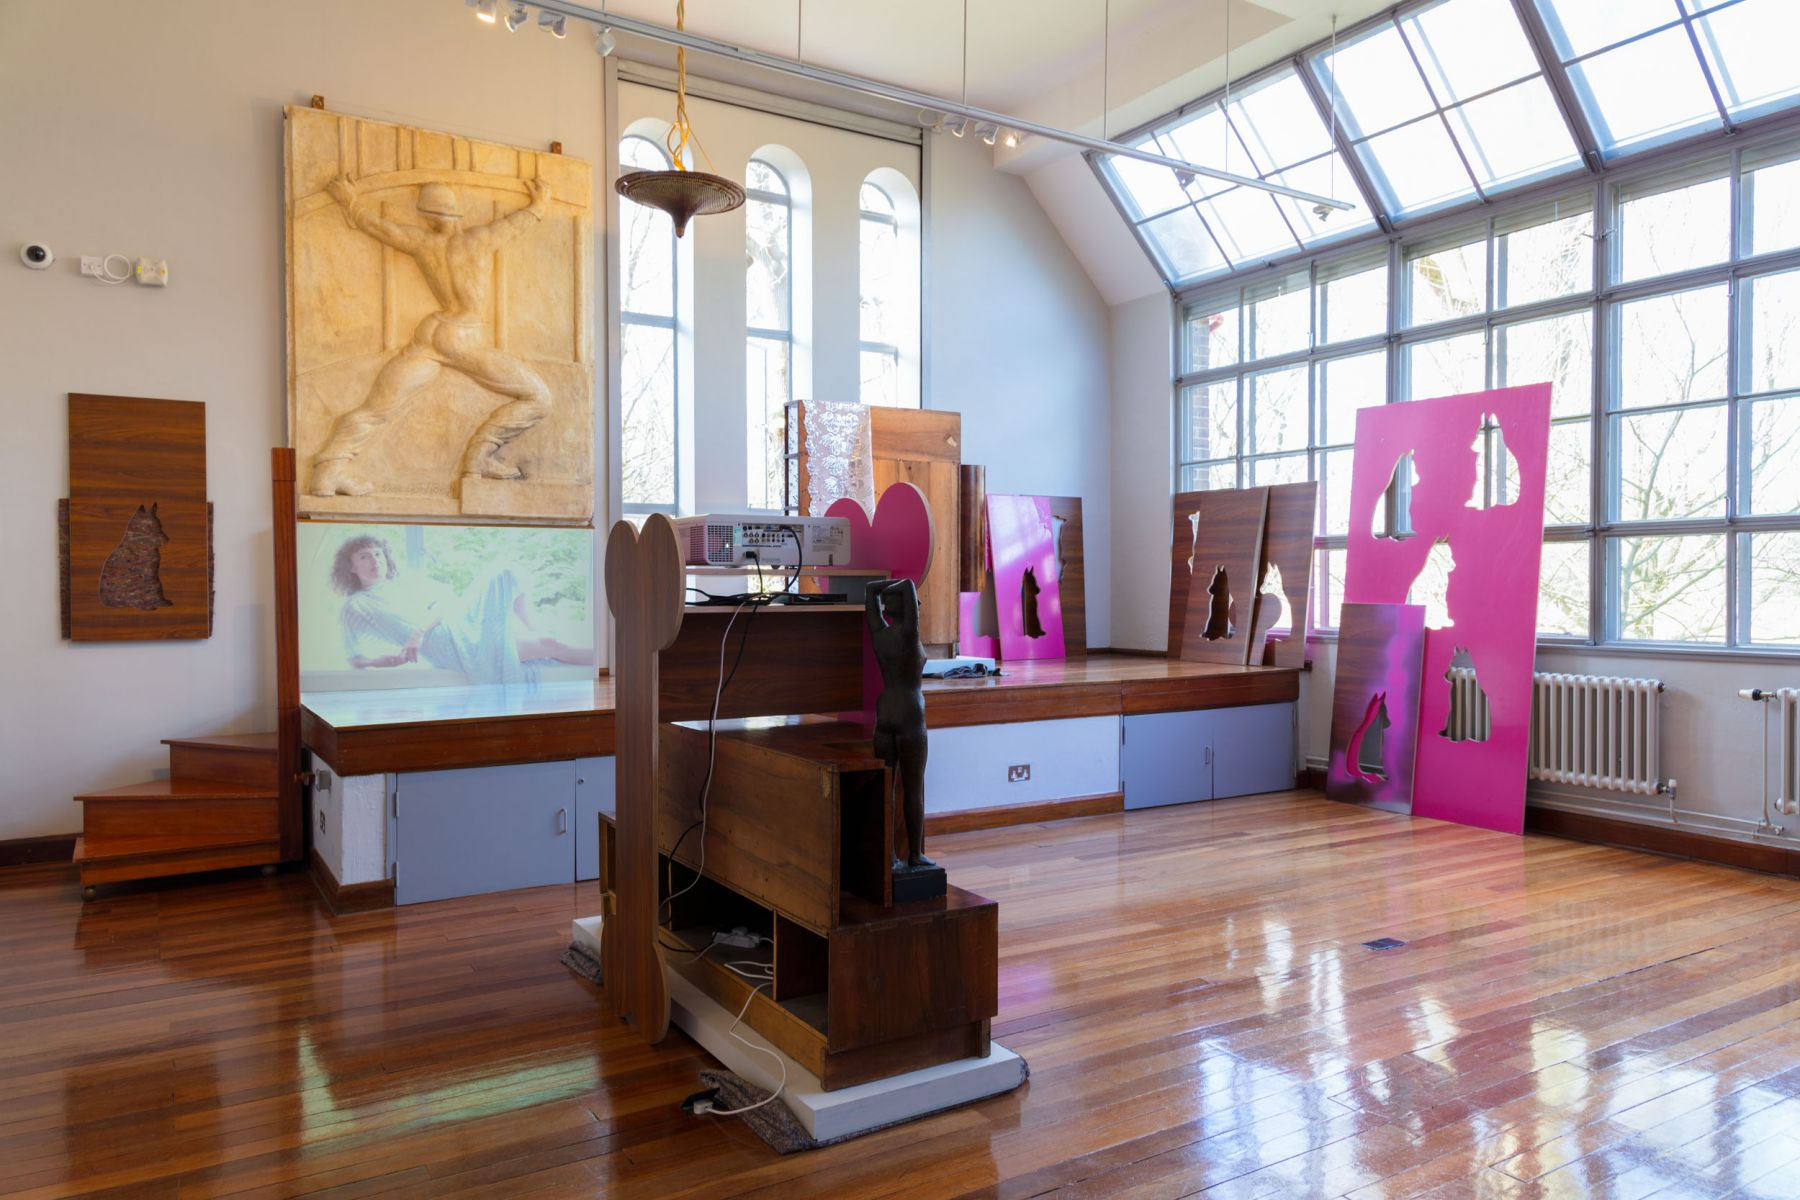 Hilary Lloyd, Installation view, Awful Girls, Dorich House Museum, Kingston University, London, 2017